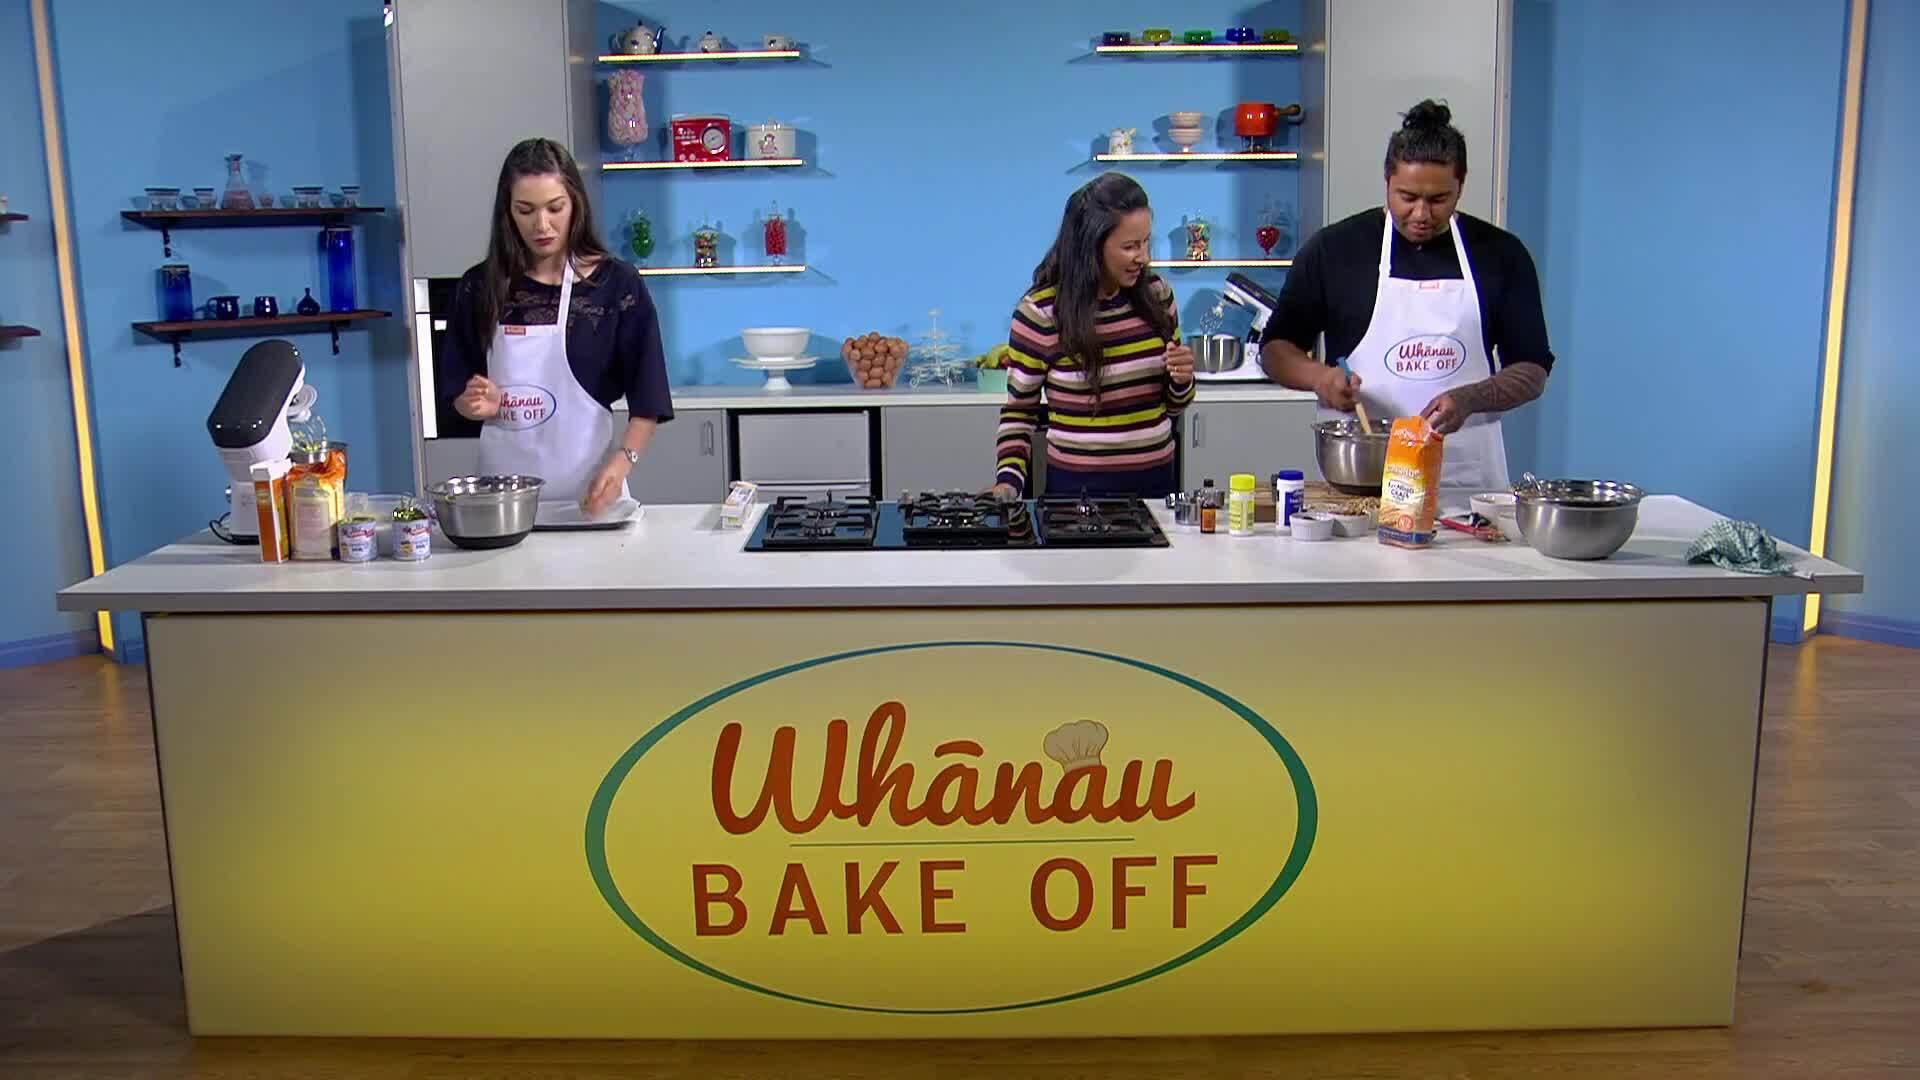 Video for Whānau Bake Off, 2 Ūpoko 1